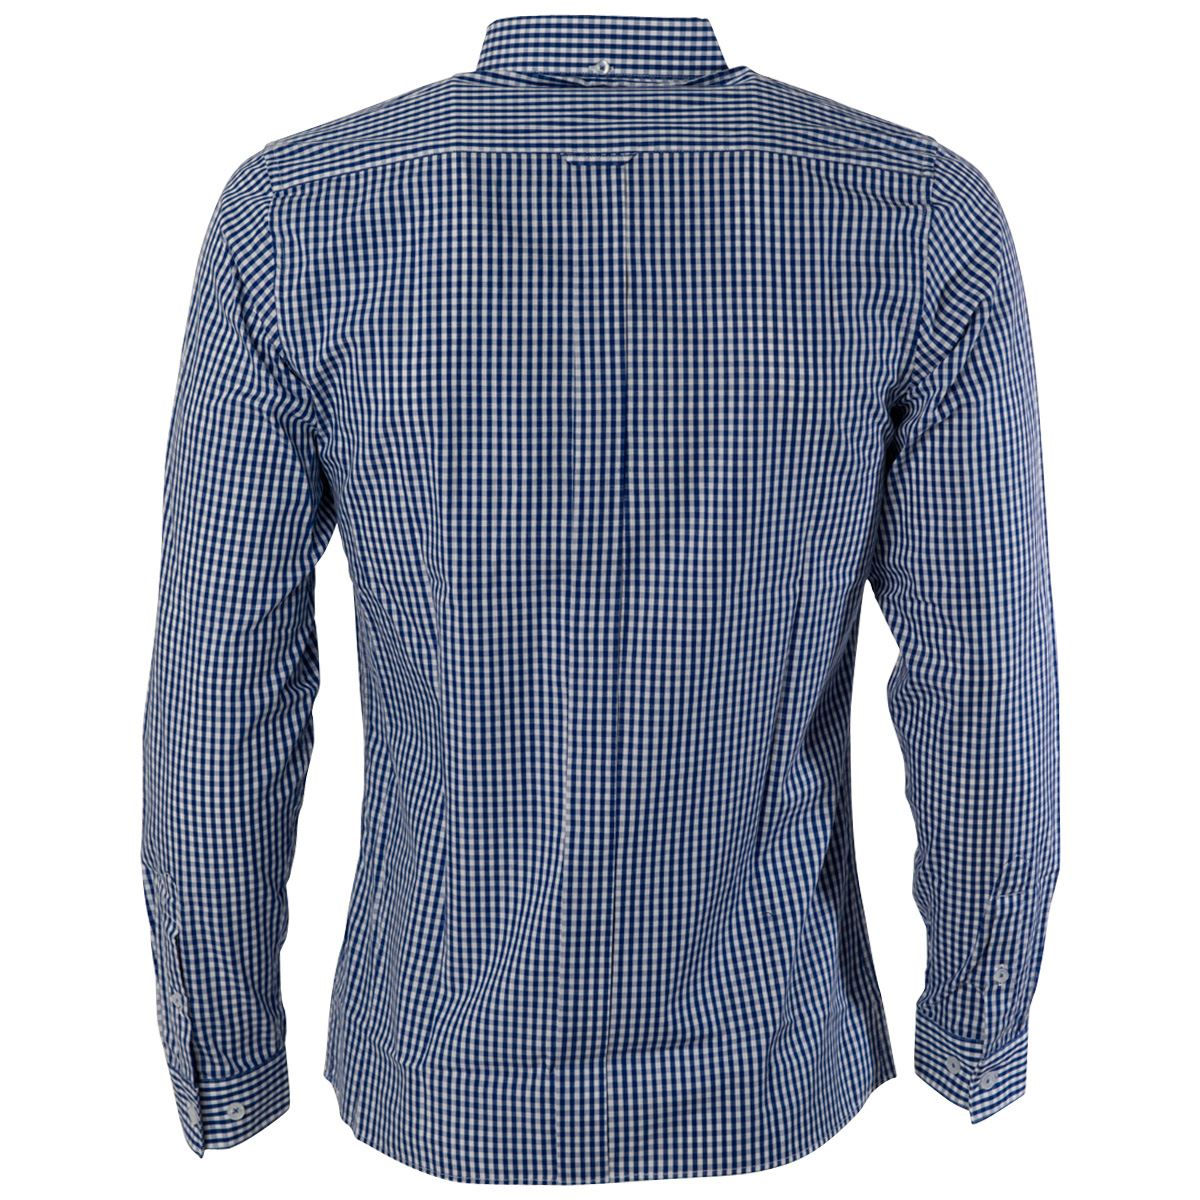 Gabicci-Vintage-Mens-Tailored-Top-Cotton-Gingham-Print-Woven-Shirt-Size-S-2XL